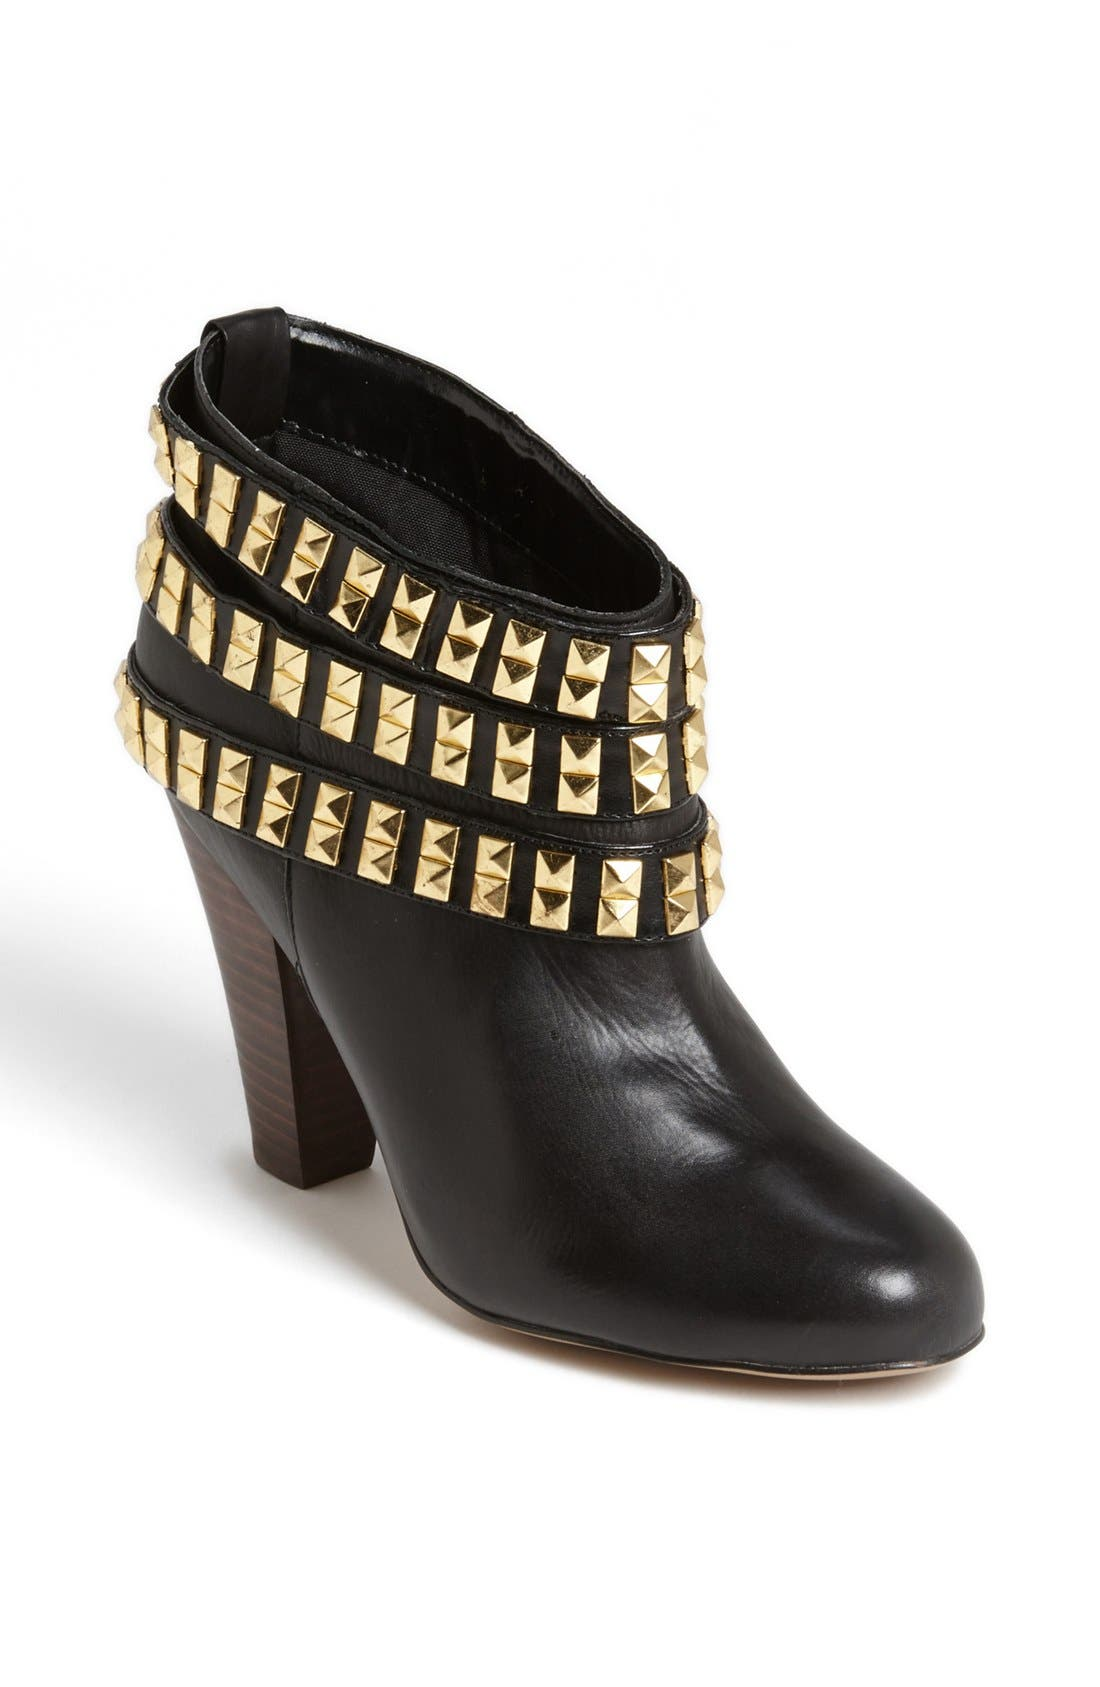 Main Image - Betsey Johnson 'Concertt' Boot